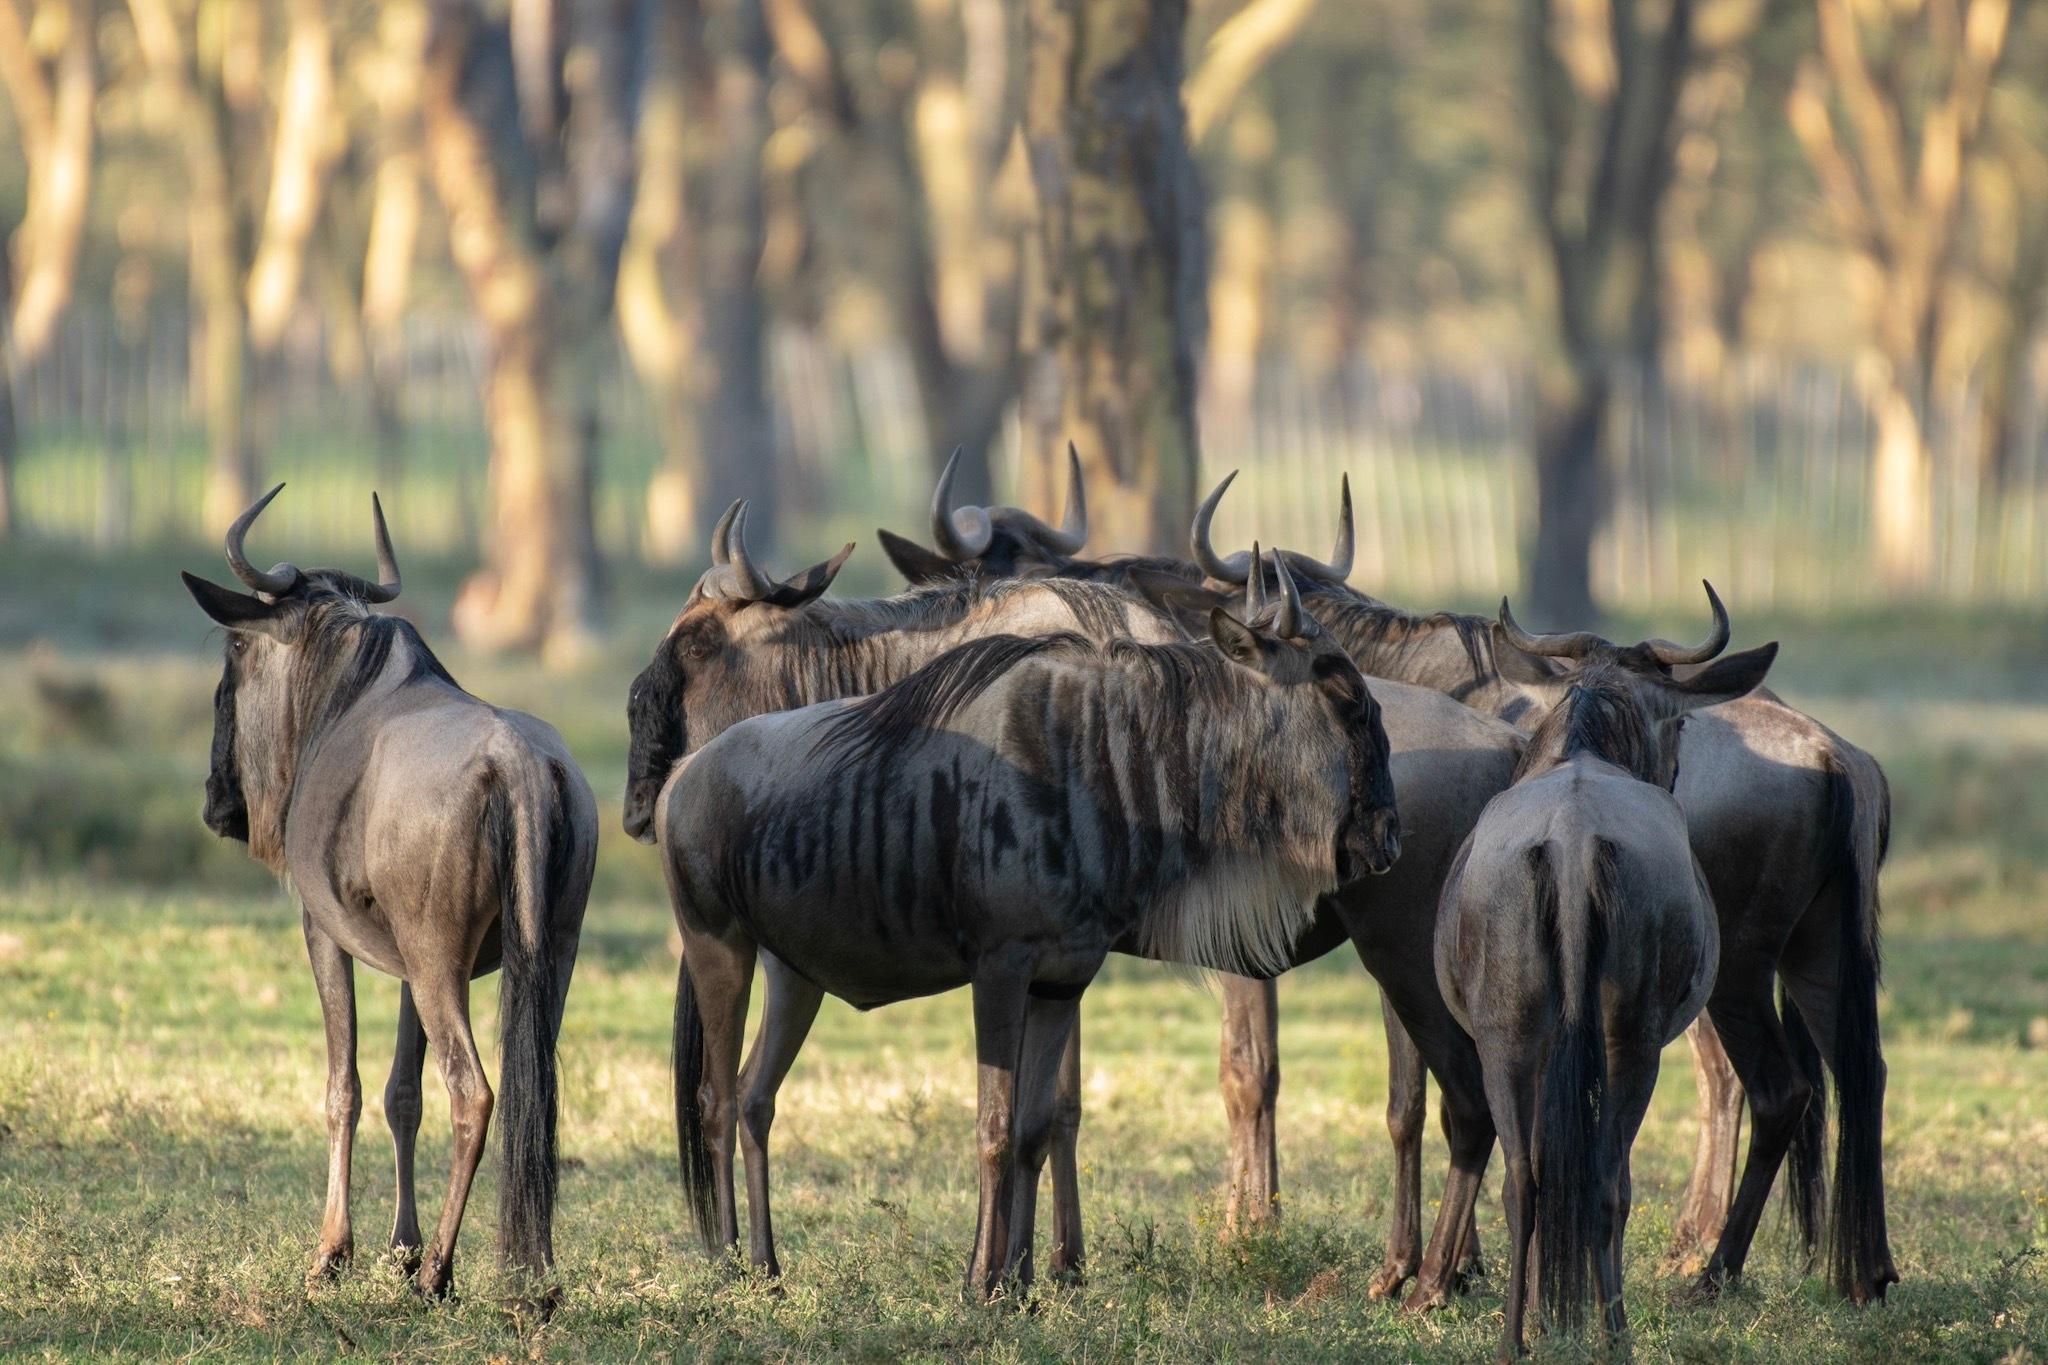 Wildebeest  by Jonathan Ball